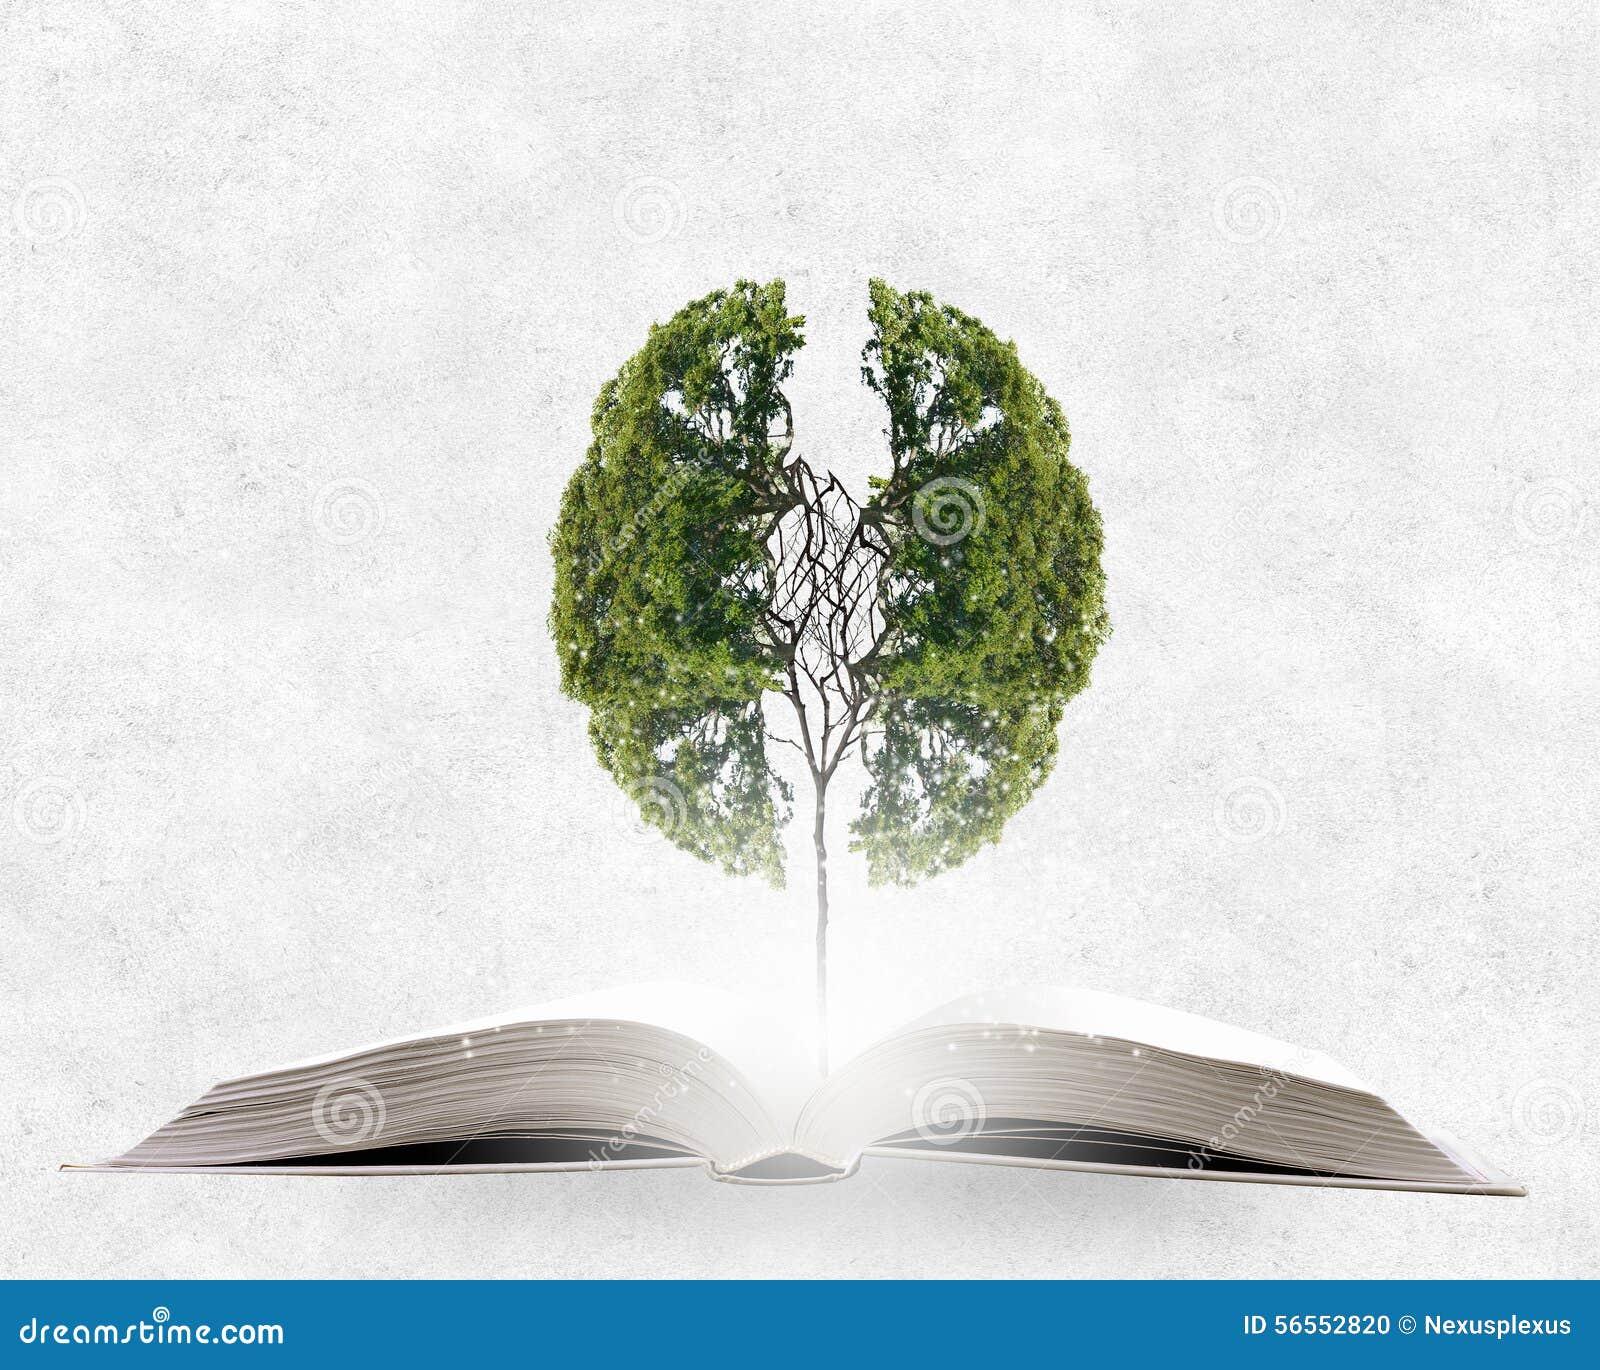 Download Ανάγνωση και μόνη εκπαίδευση Στοκ Εικόνες - εικόνα από ανάγνωση, έξυπνος: 56552820